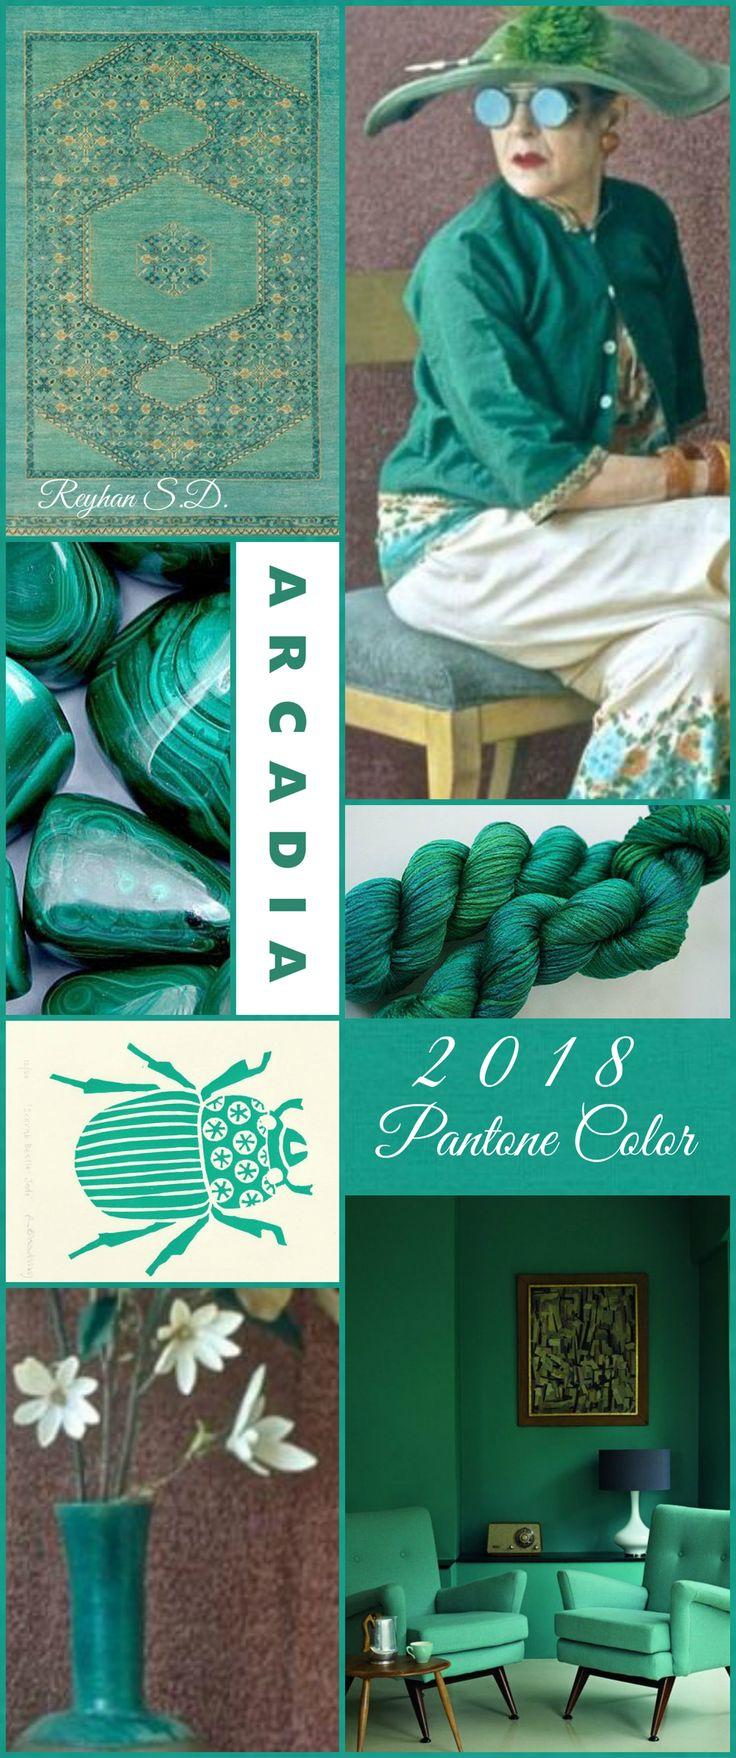 ' Arcadia- 2018 Pantone Color '' by Reyhan S.D